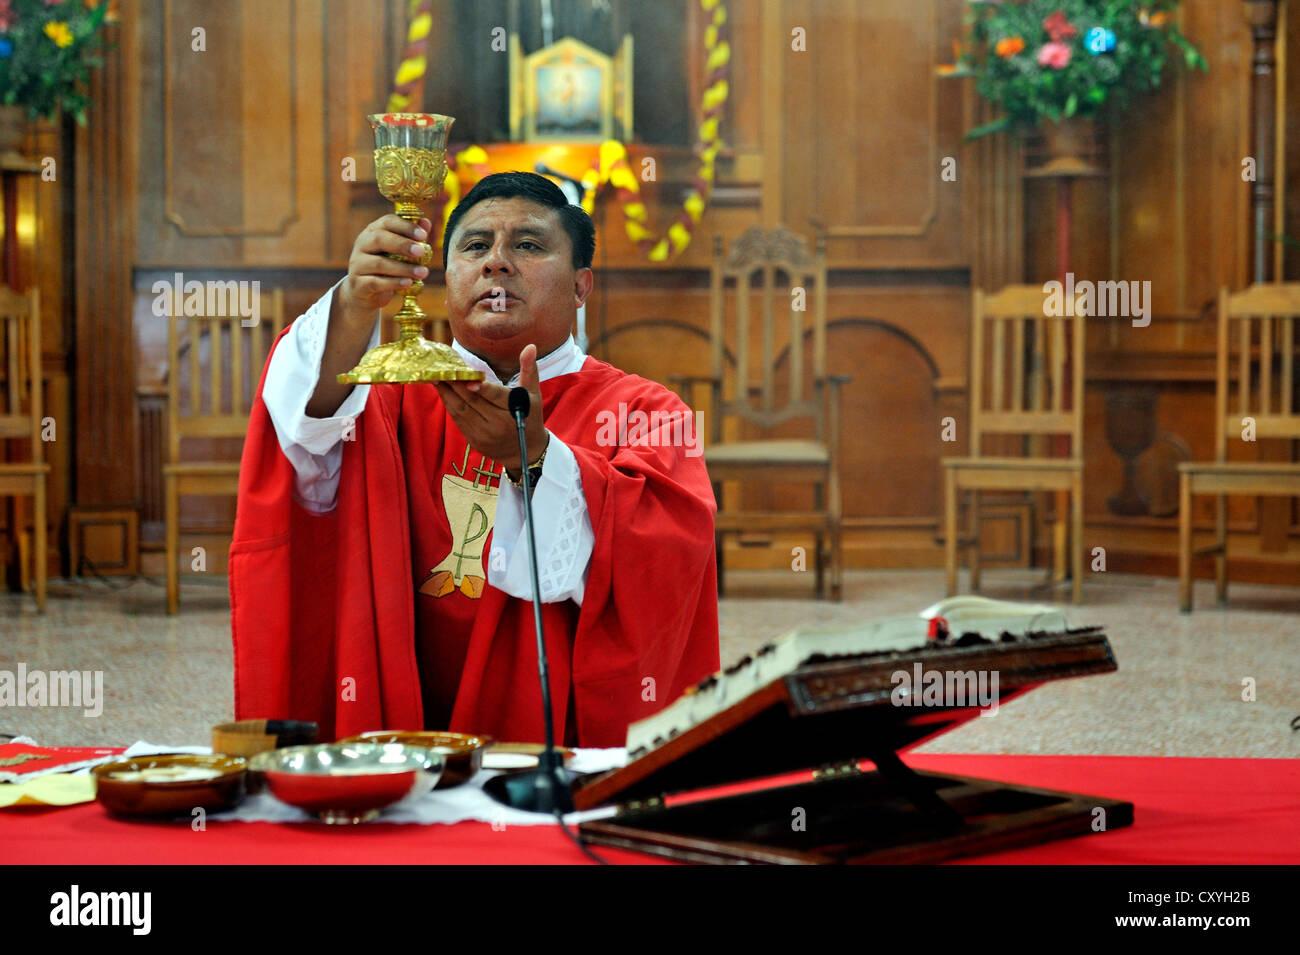 Whitsun mass, consecration, Dios Con Nosotros church parish, El Mesquital, Guatemala City, Guatemala, Central America - Stock Image